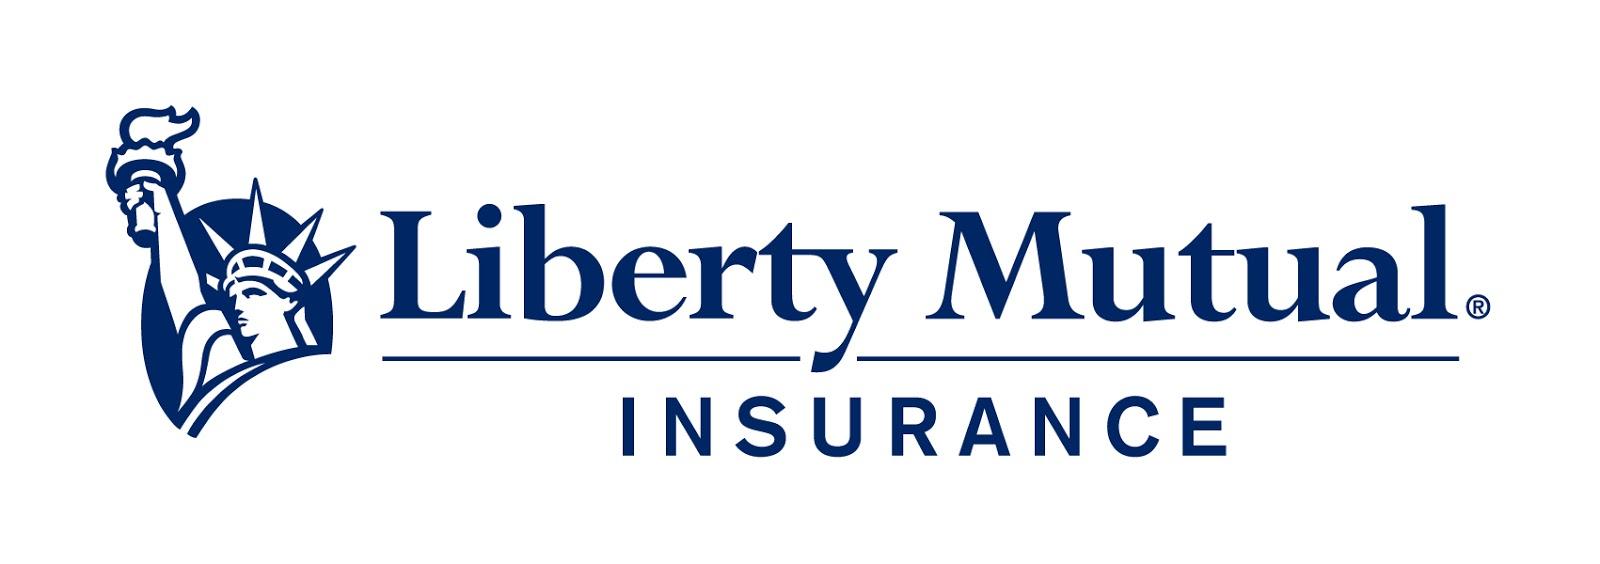 Liberty Mutual Logo And Description  Logo Engine